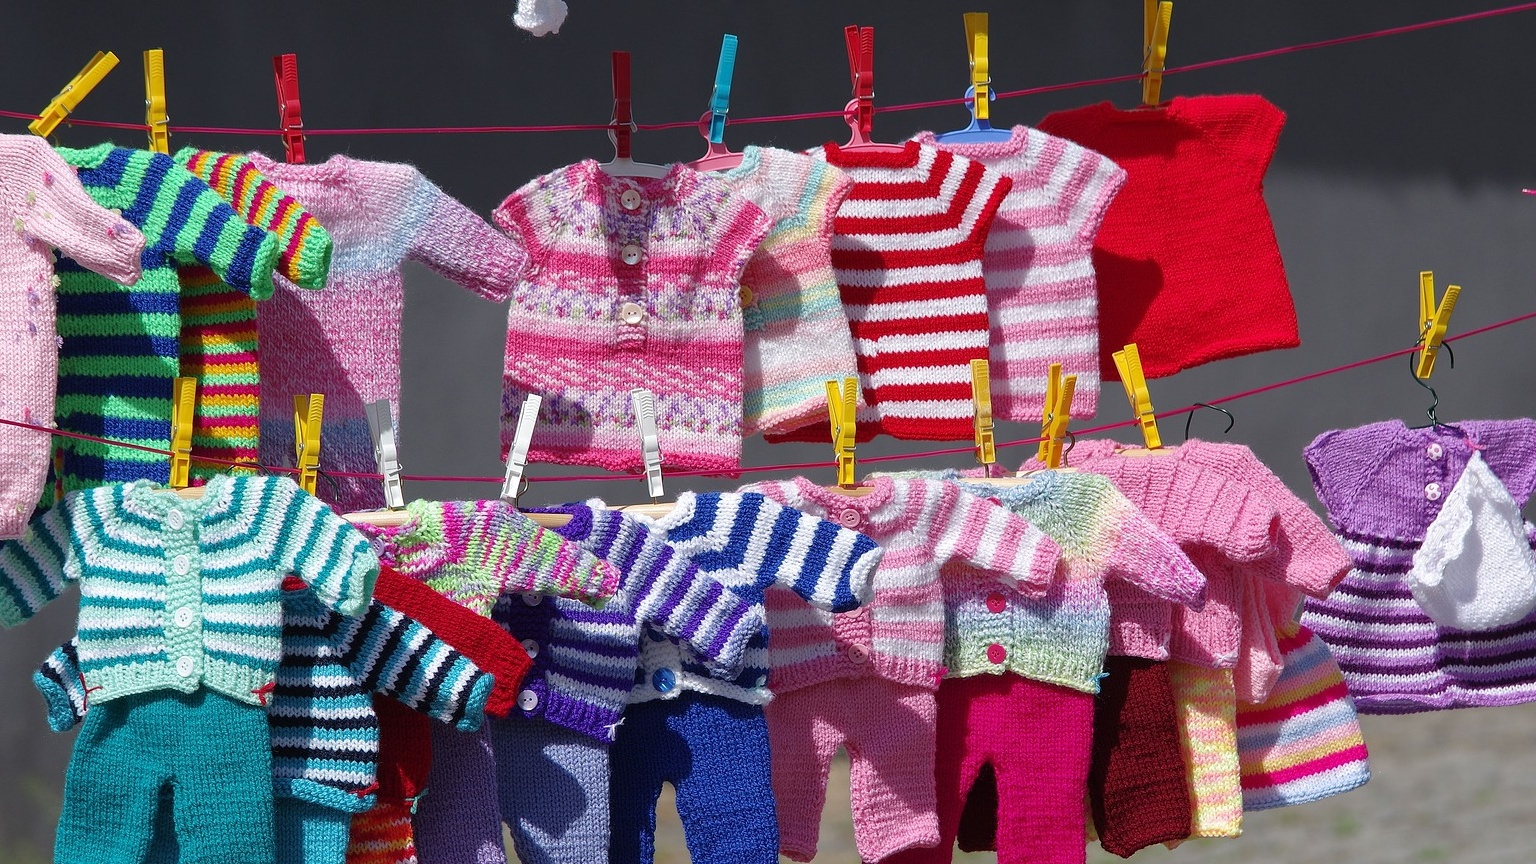 clothing-3135444_1920 Cropped_1558347558758.jpg.jpg